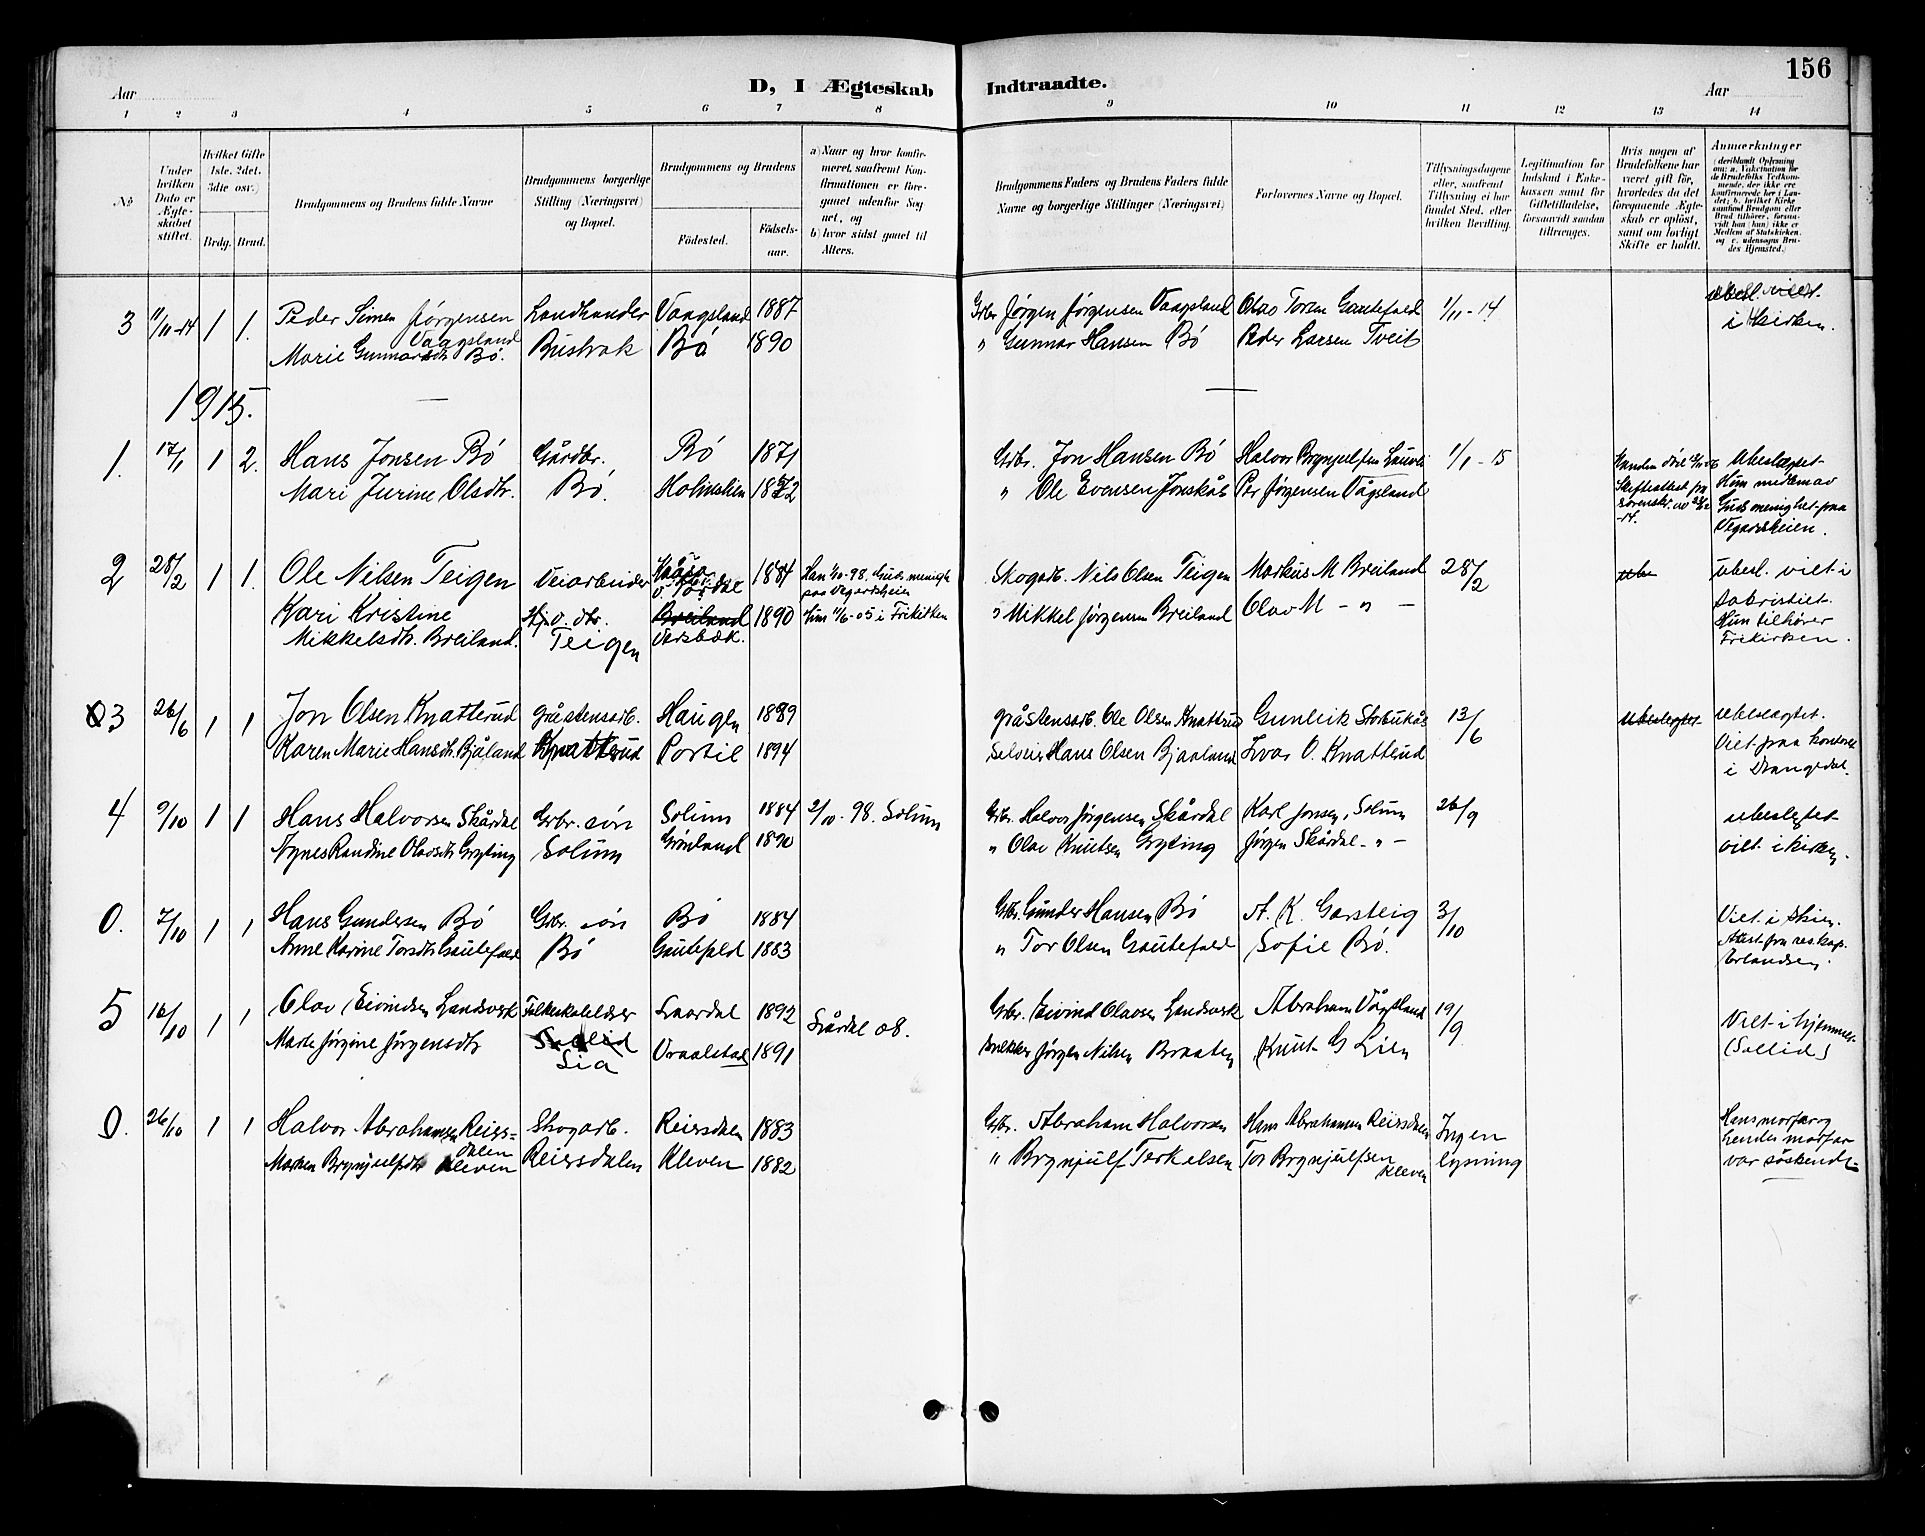 SAKO, Drangedal kirkebøker, G/Gb/L0002: Klokkerbok nr. II 2, 1895-1918, s. 156